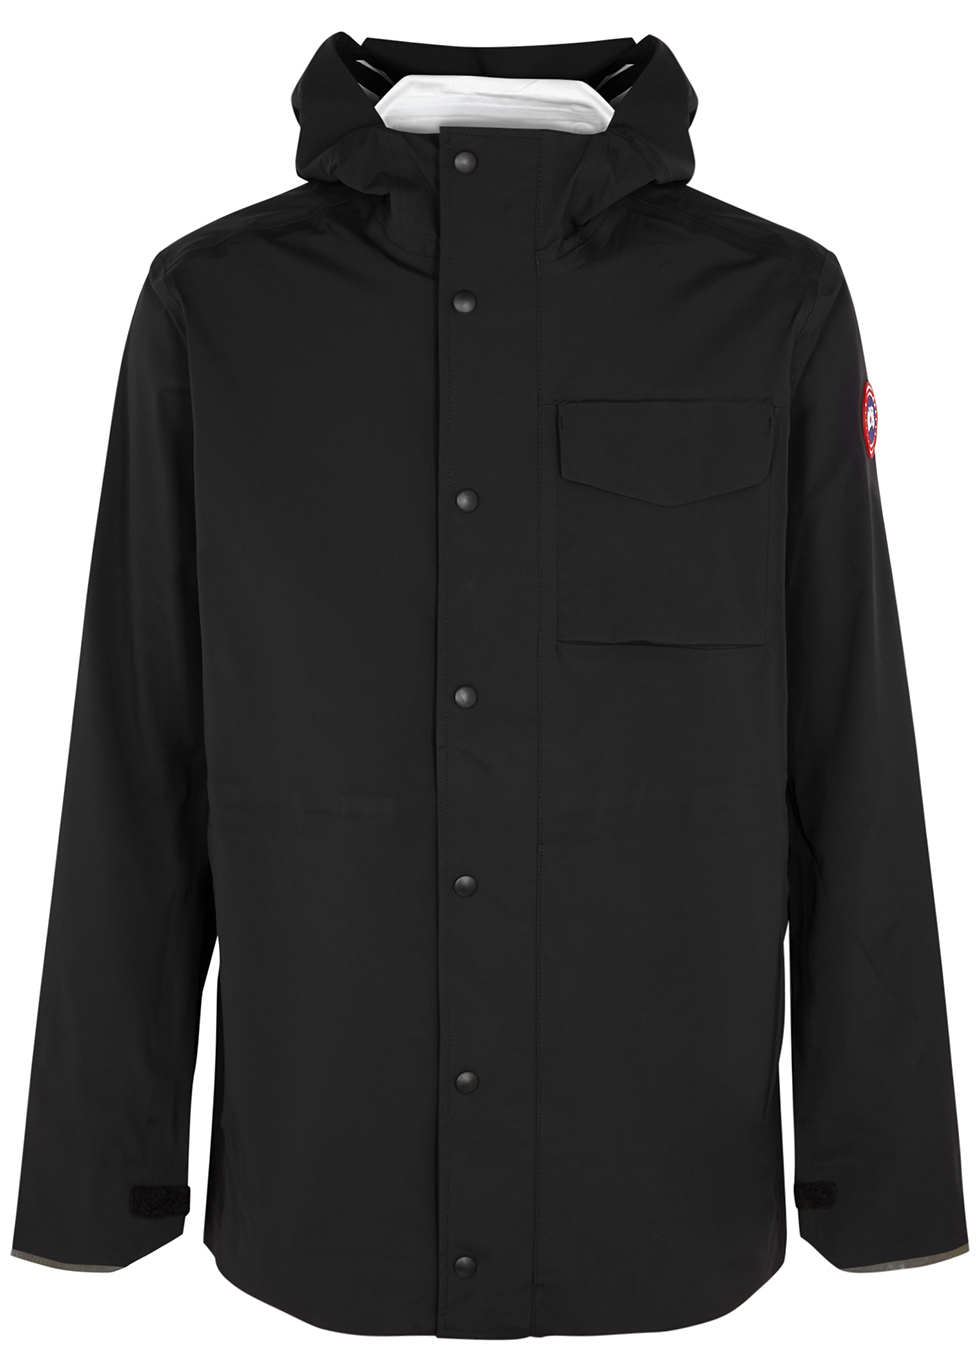 Nanaimo black Tri-Durance shell jacket